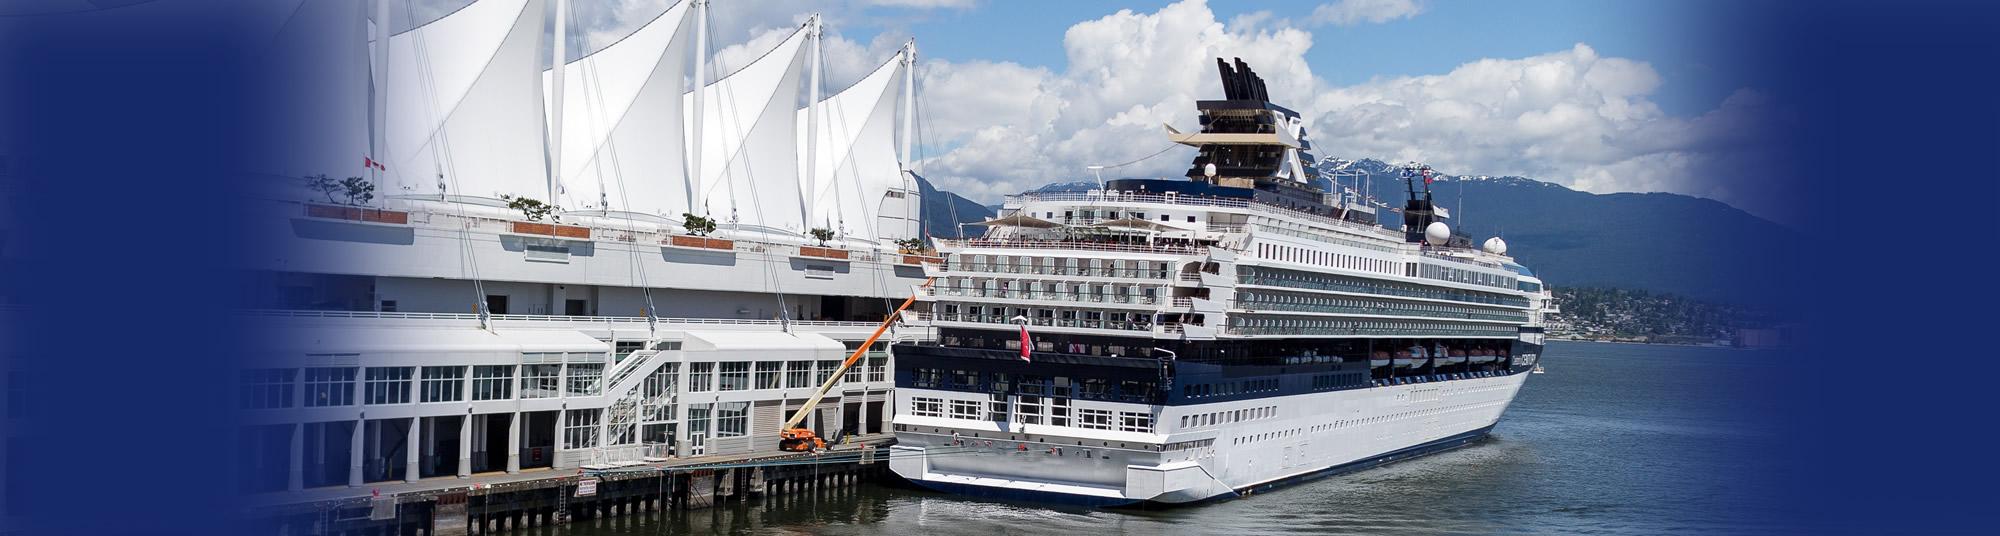 vancouver-cruise-ship-limo